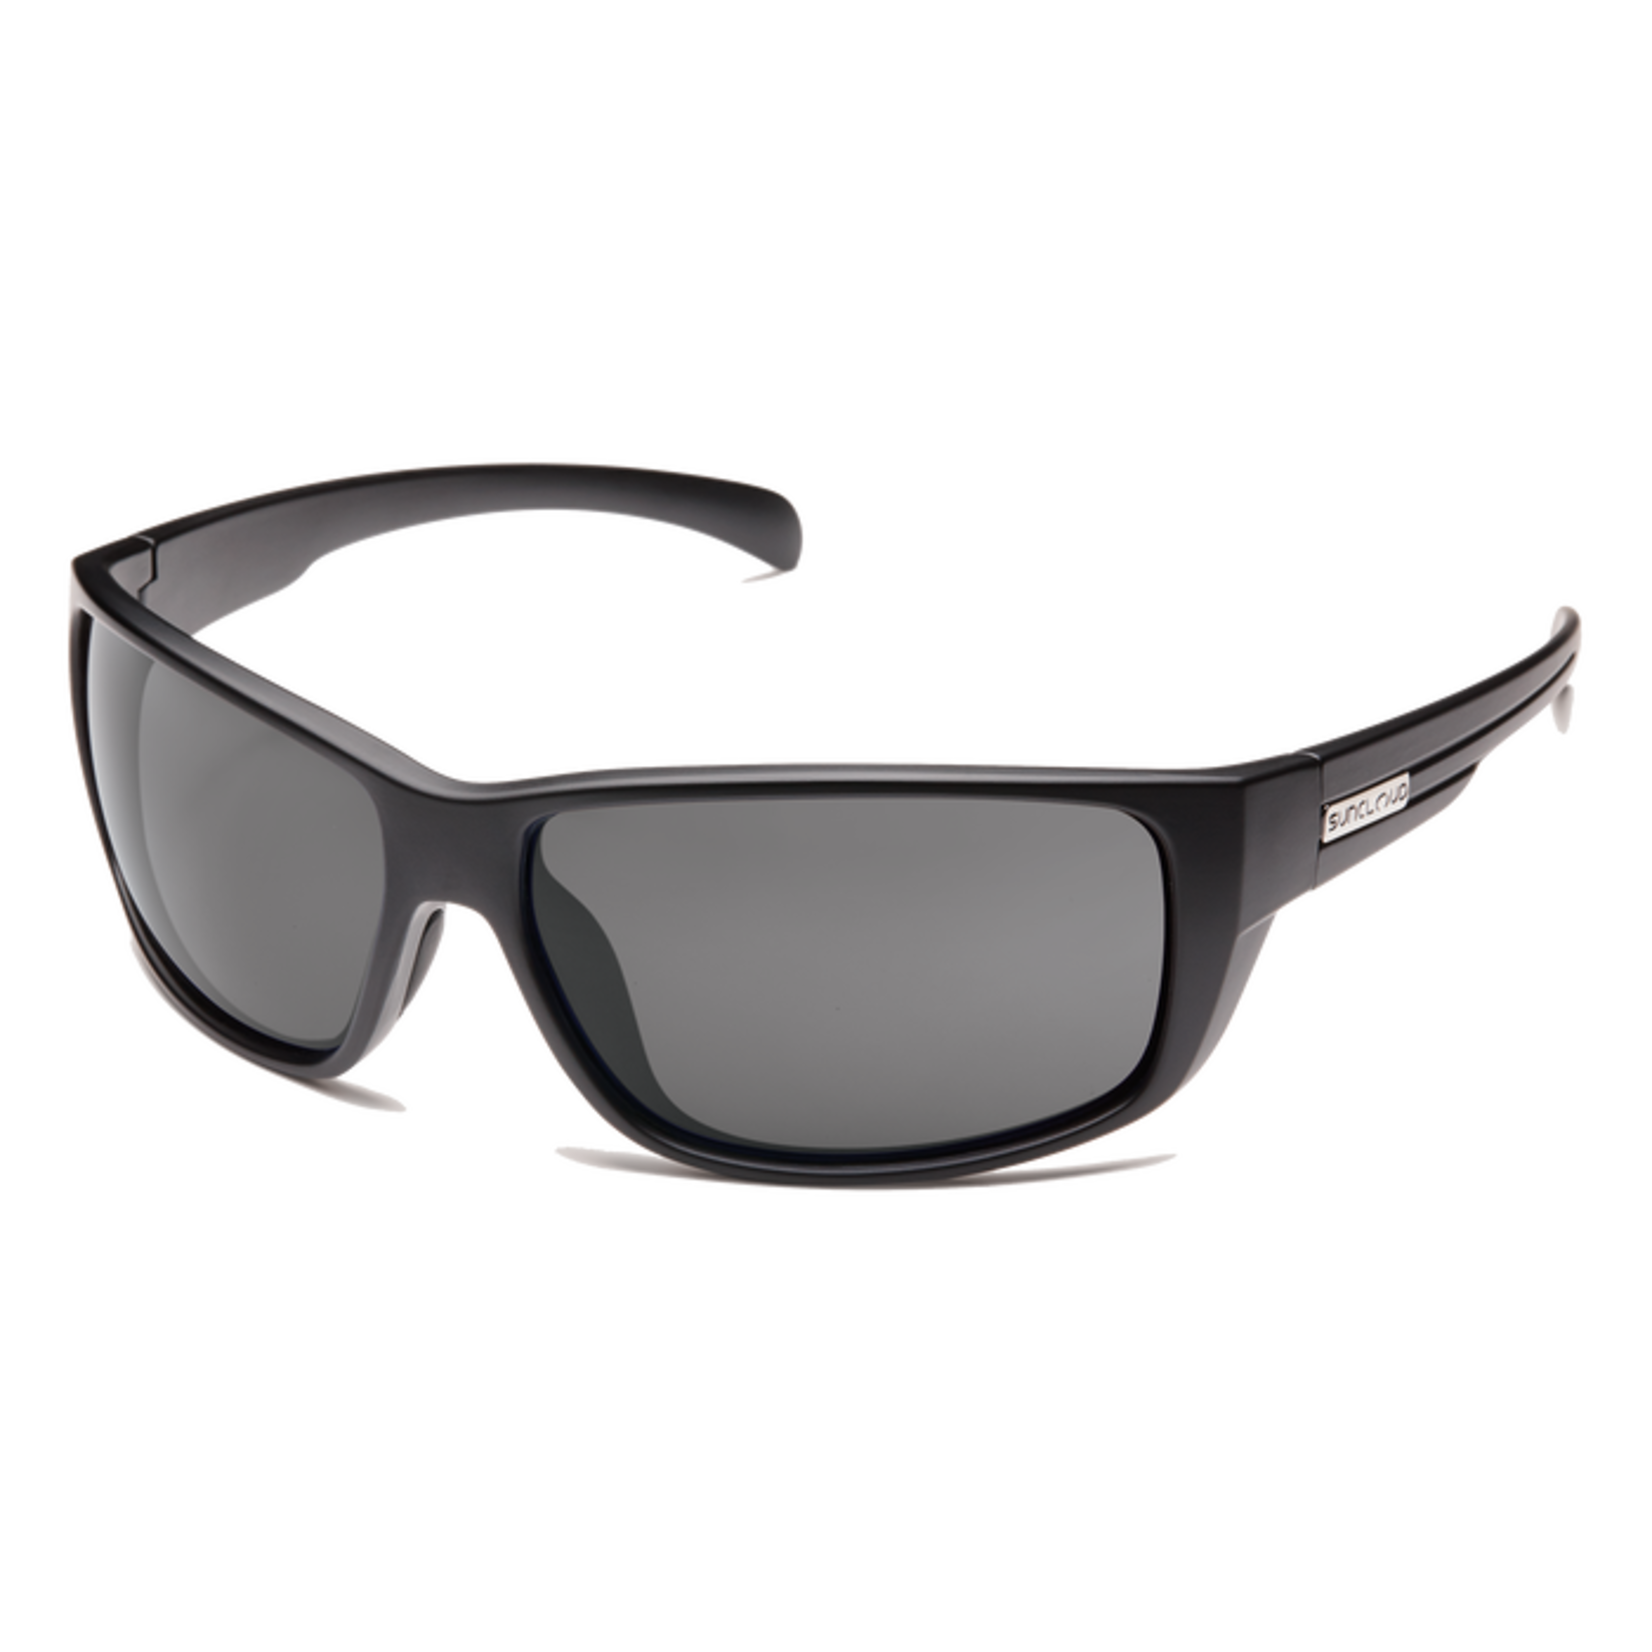 Suncloud Optics Suncloud Milestone Polarized Sunglasses